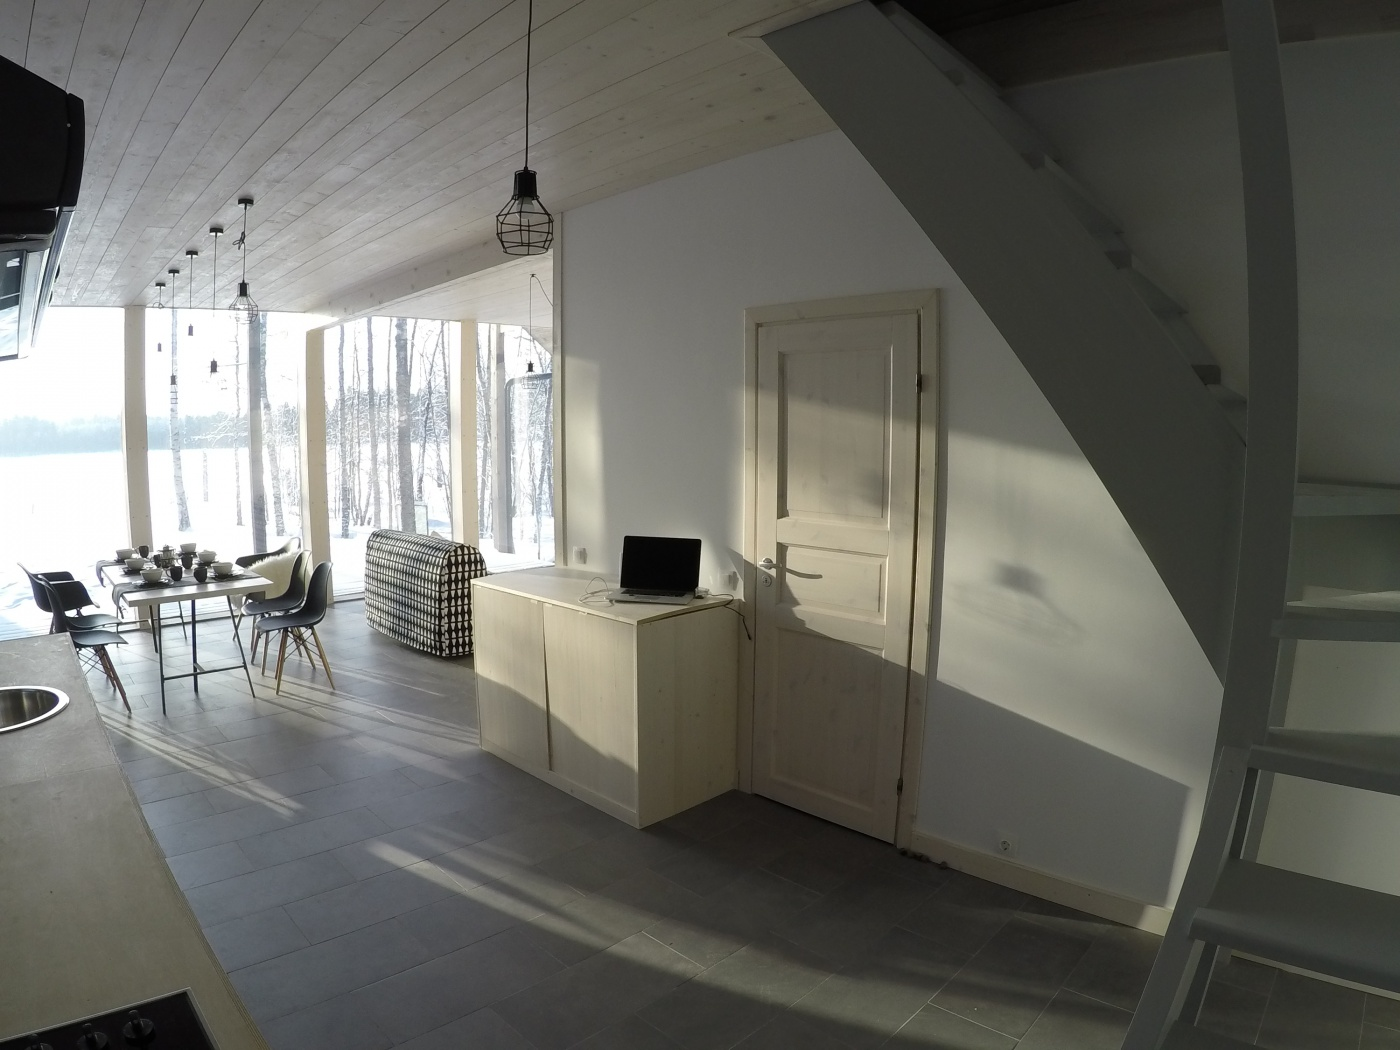 Коттеджный комплекс «Ахвенлампи» Республика Карелия Лофт-хаус «Матриярви», фото 13